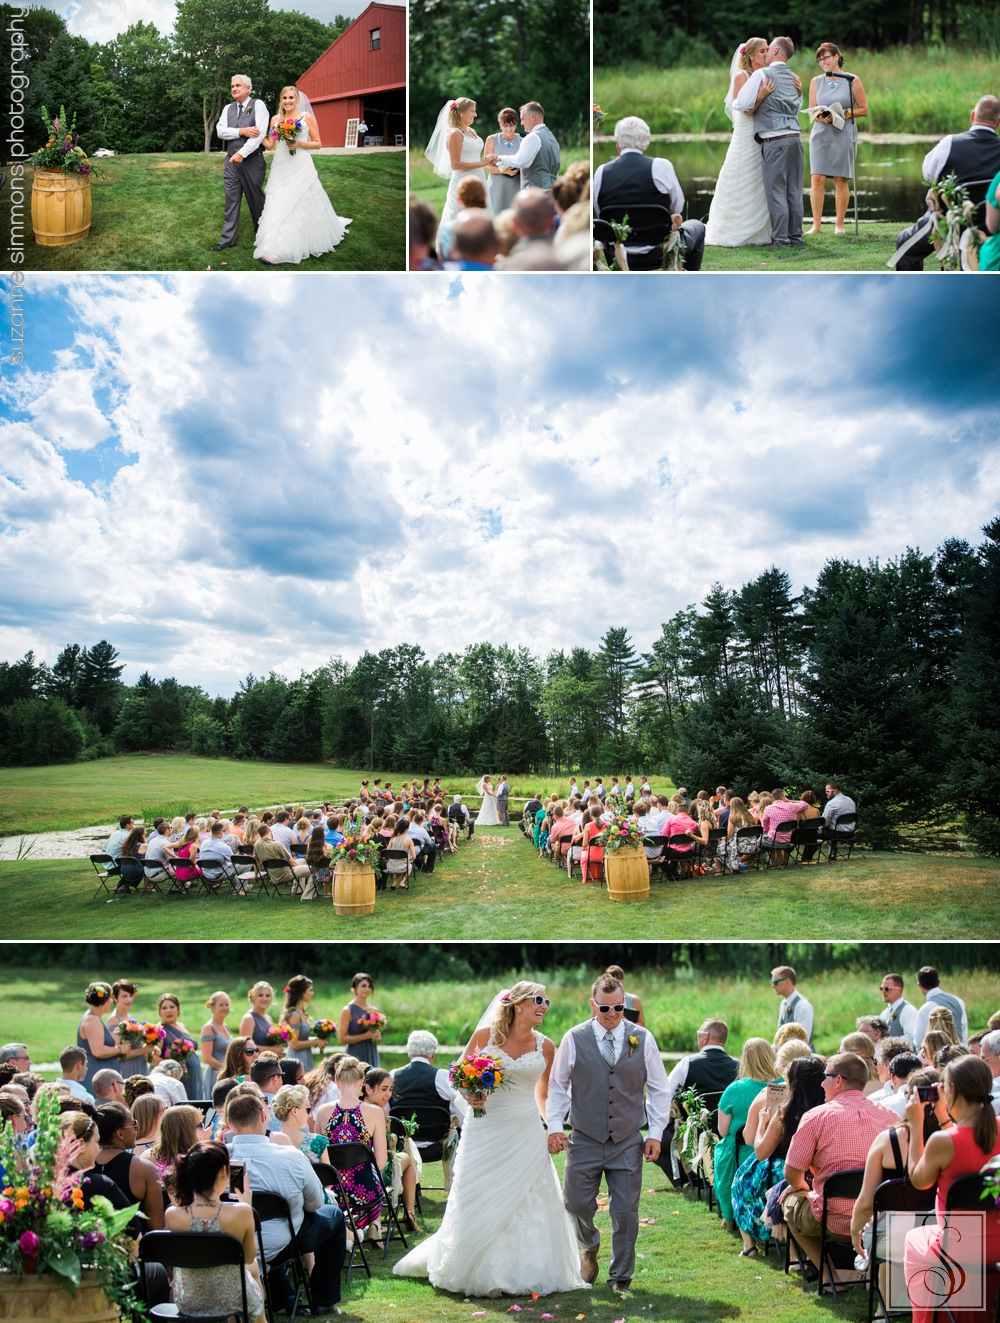 Outdoor ceremony at The William Allen Farm